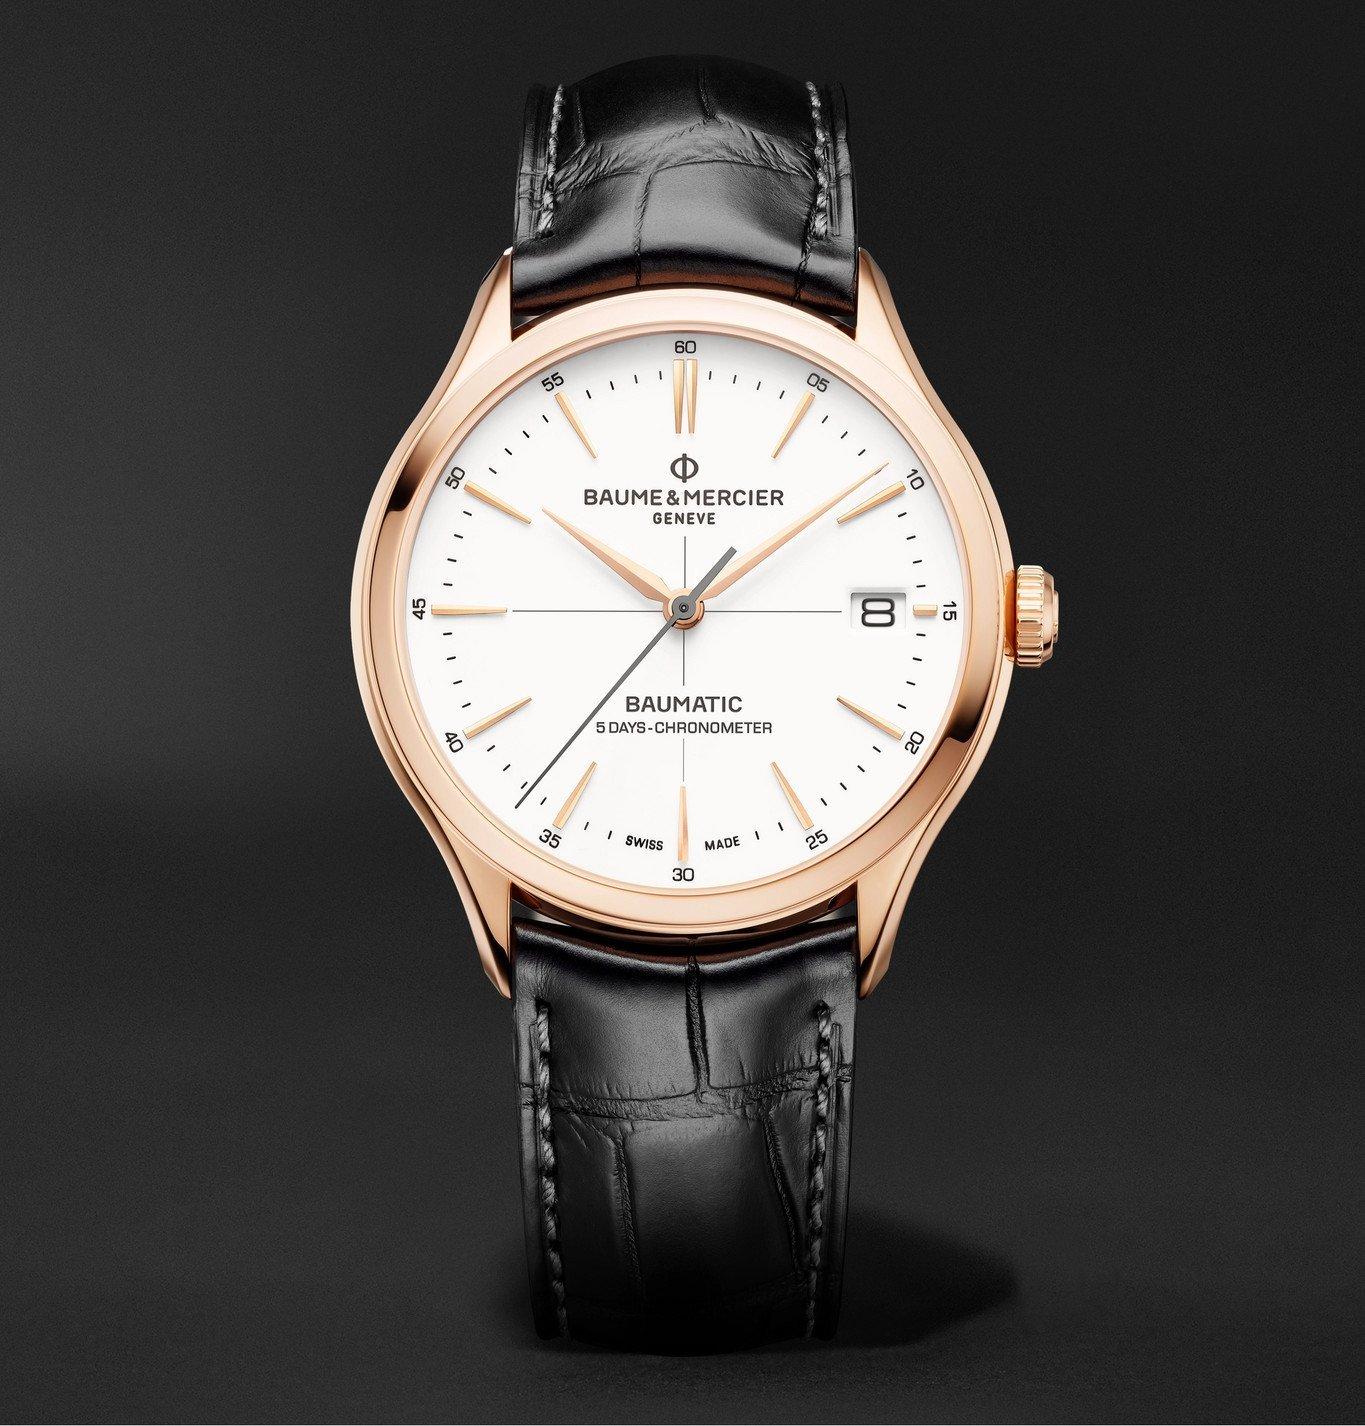 Photo: Baume & Mercier - Clifton Baumatic Automatic Chronometer 39mm 18-Karat Rose Gold and Alligator Watch, Ref. No. M0A10469 - White